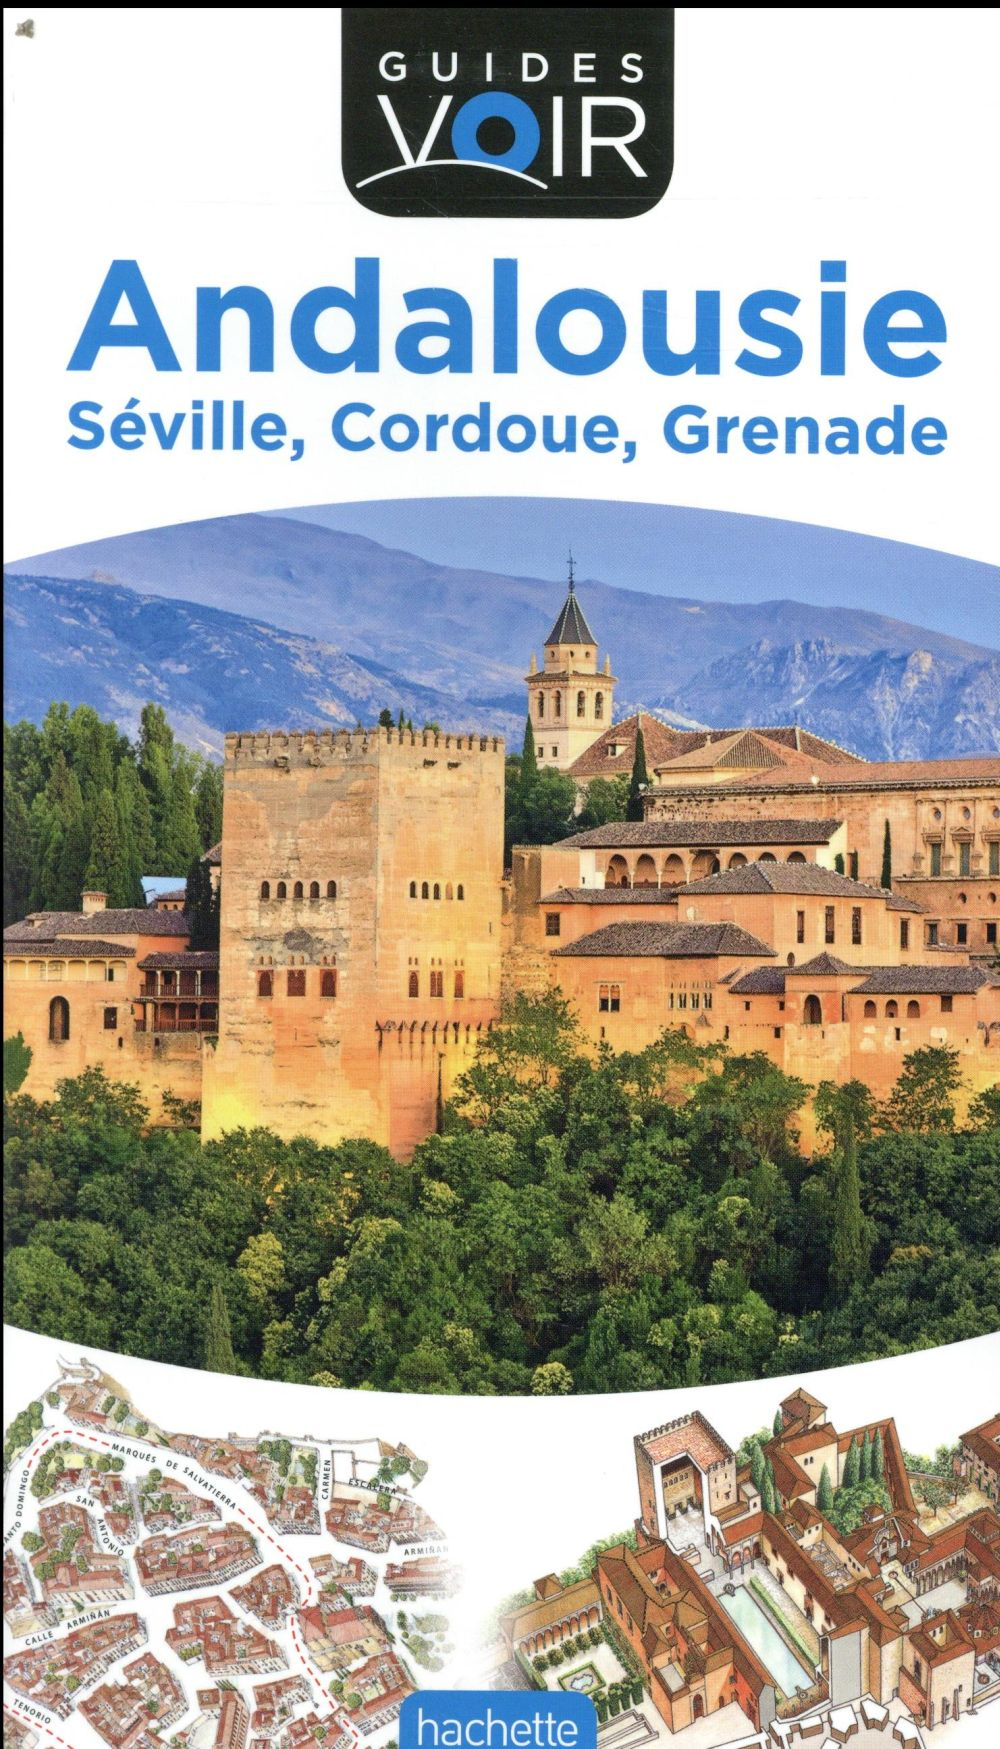 Guides Voir ; Andalousie ; Seville, Cordoue, Grenade (Edition 2018)